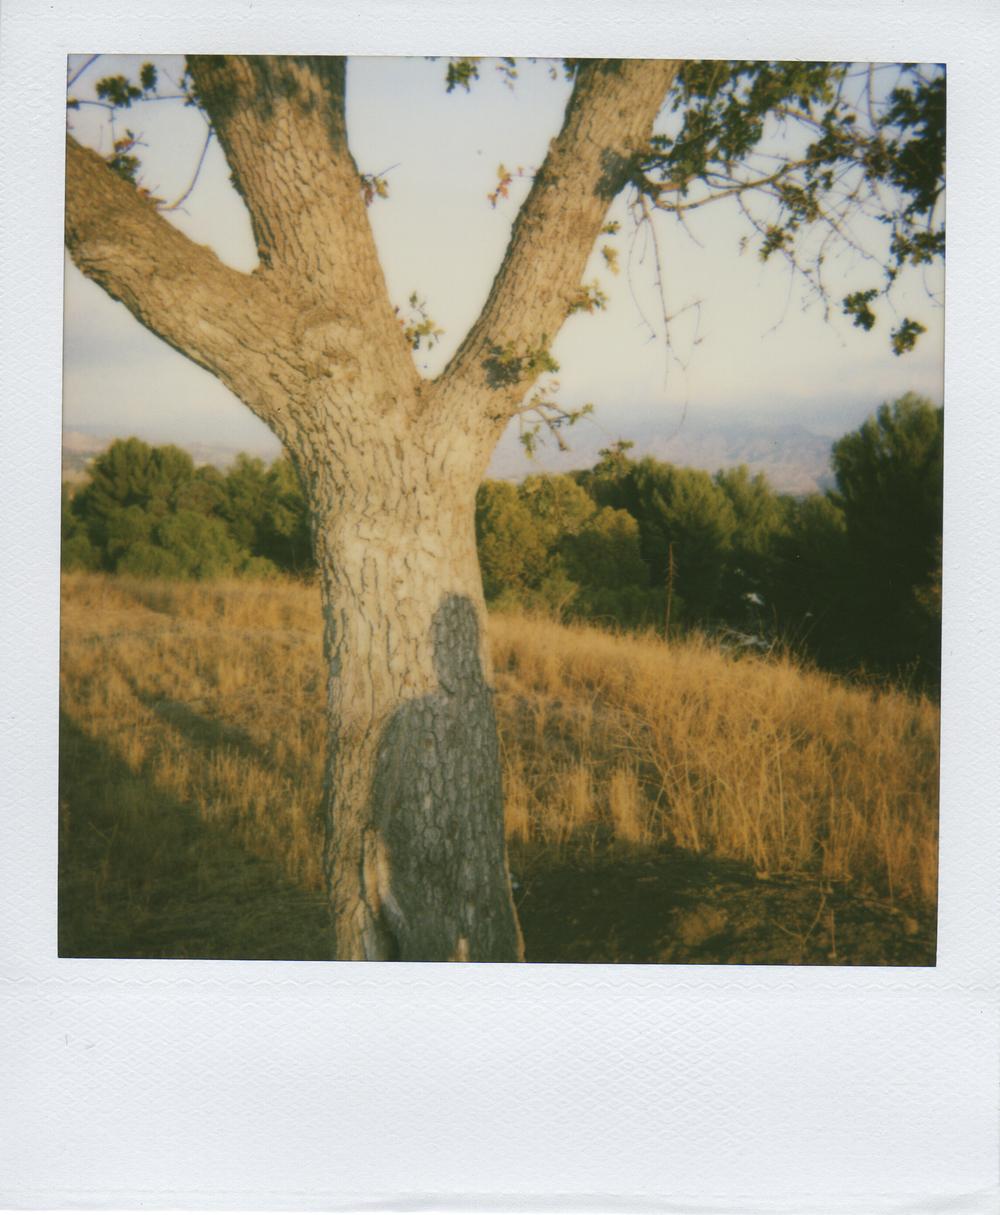 jlaurence-polaroid-039.jpg